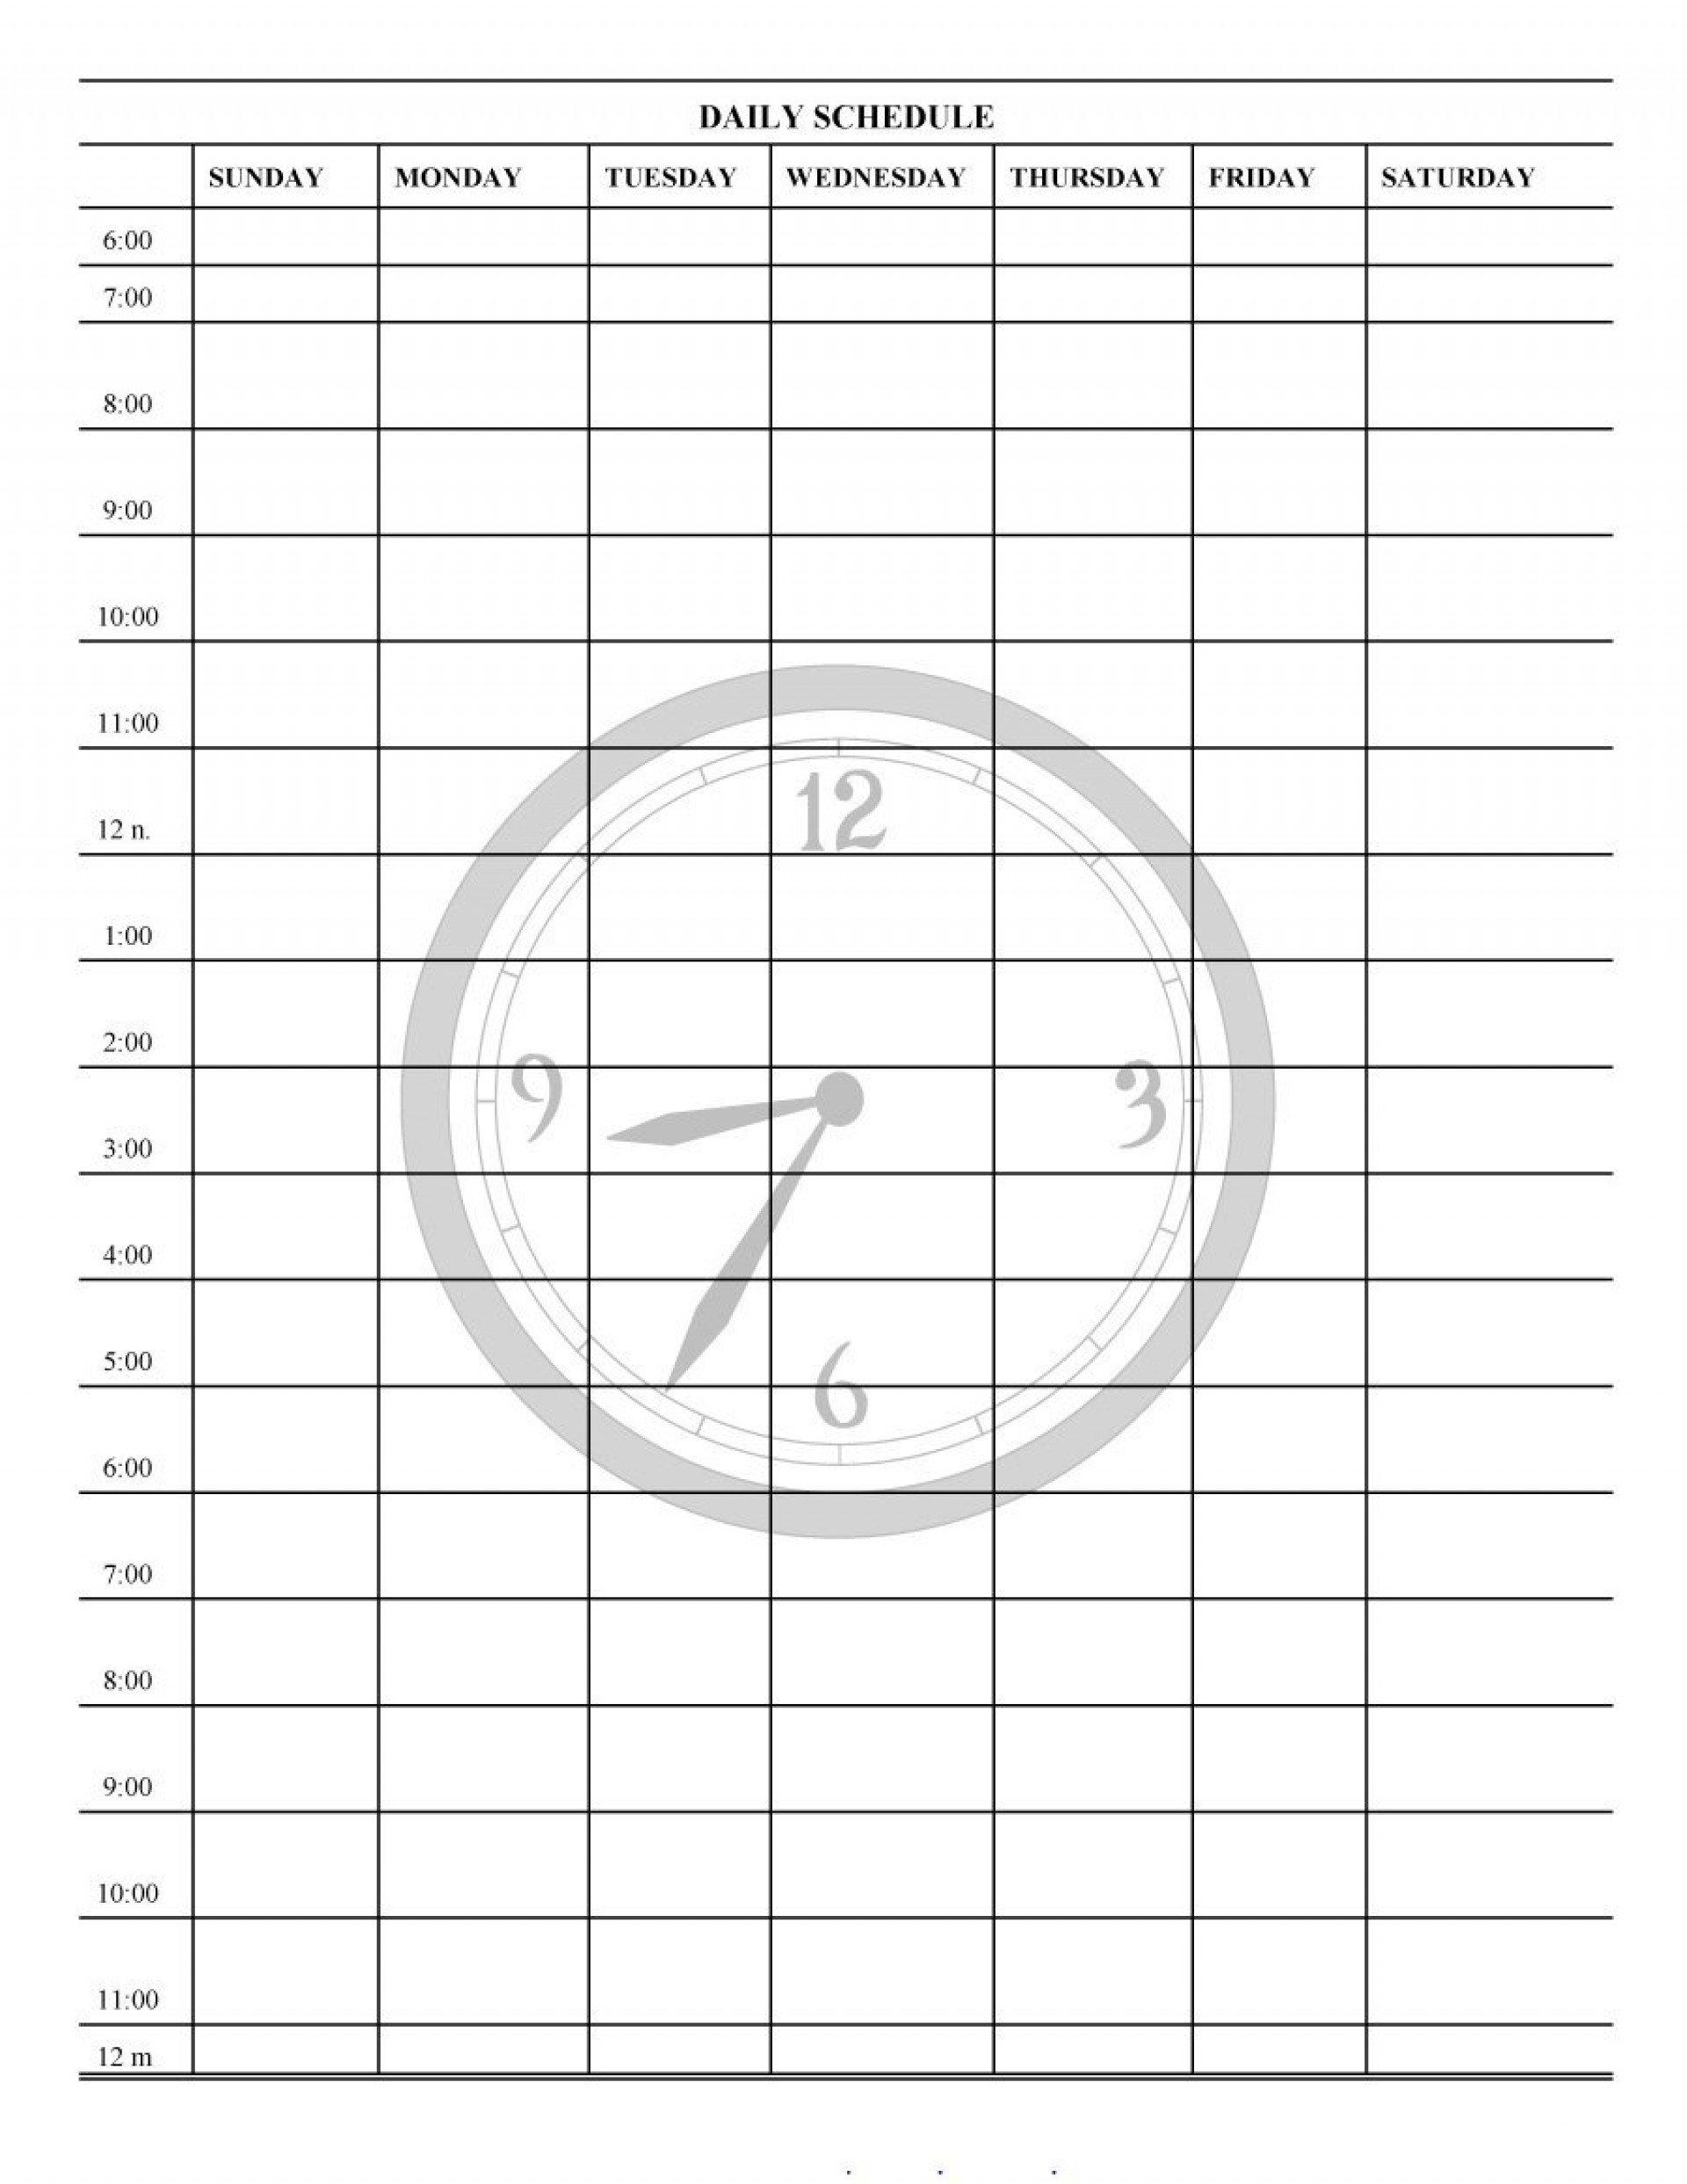 Free 24 Hour Daily Calendar Template   Daily Calendar Daily Calendar With Hour